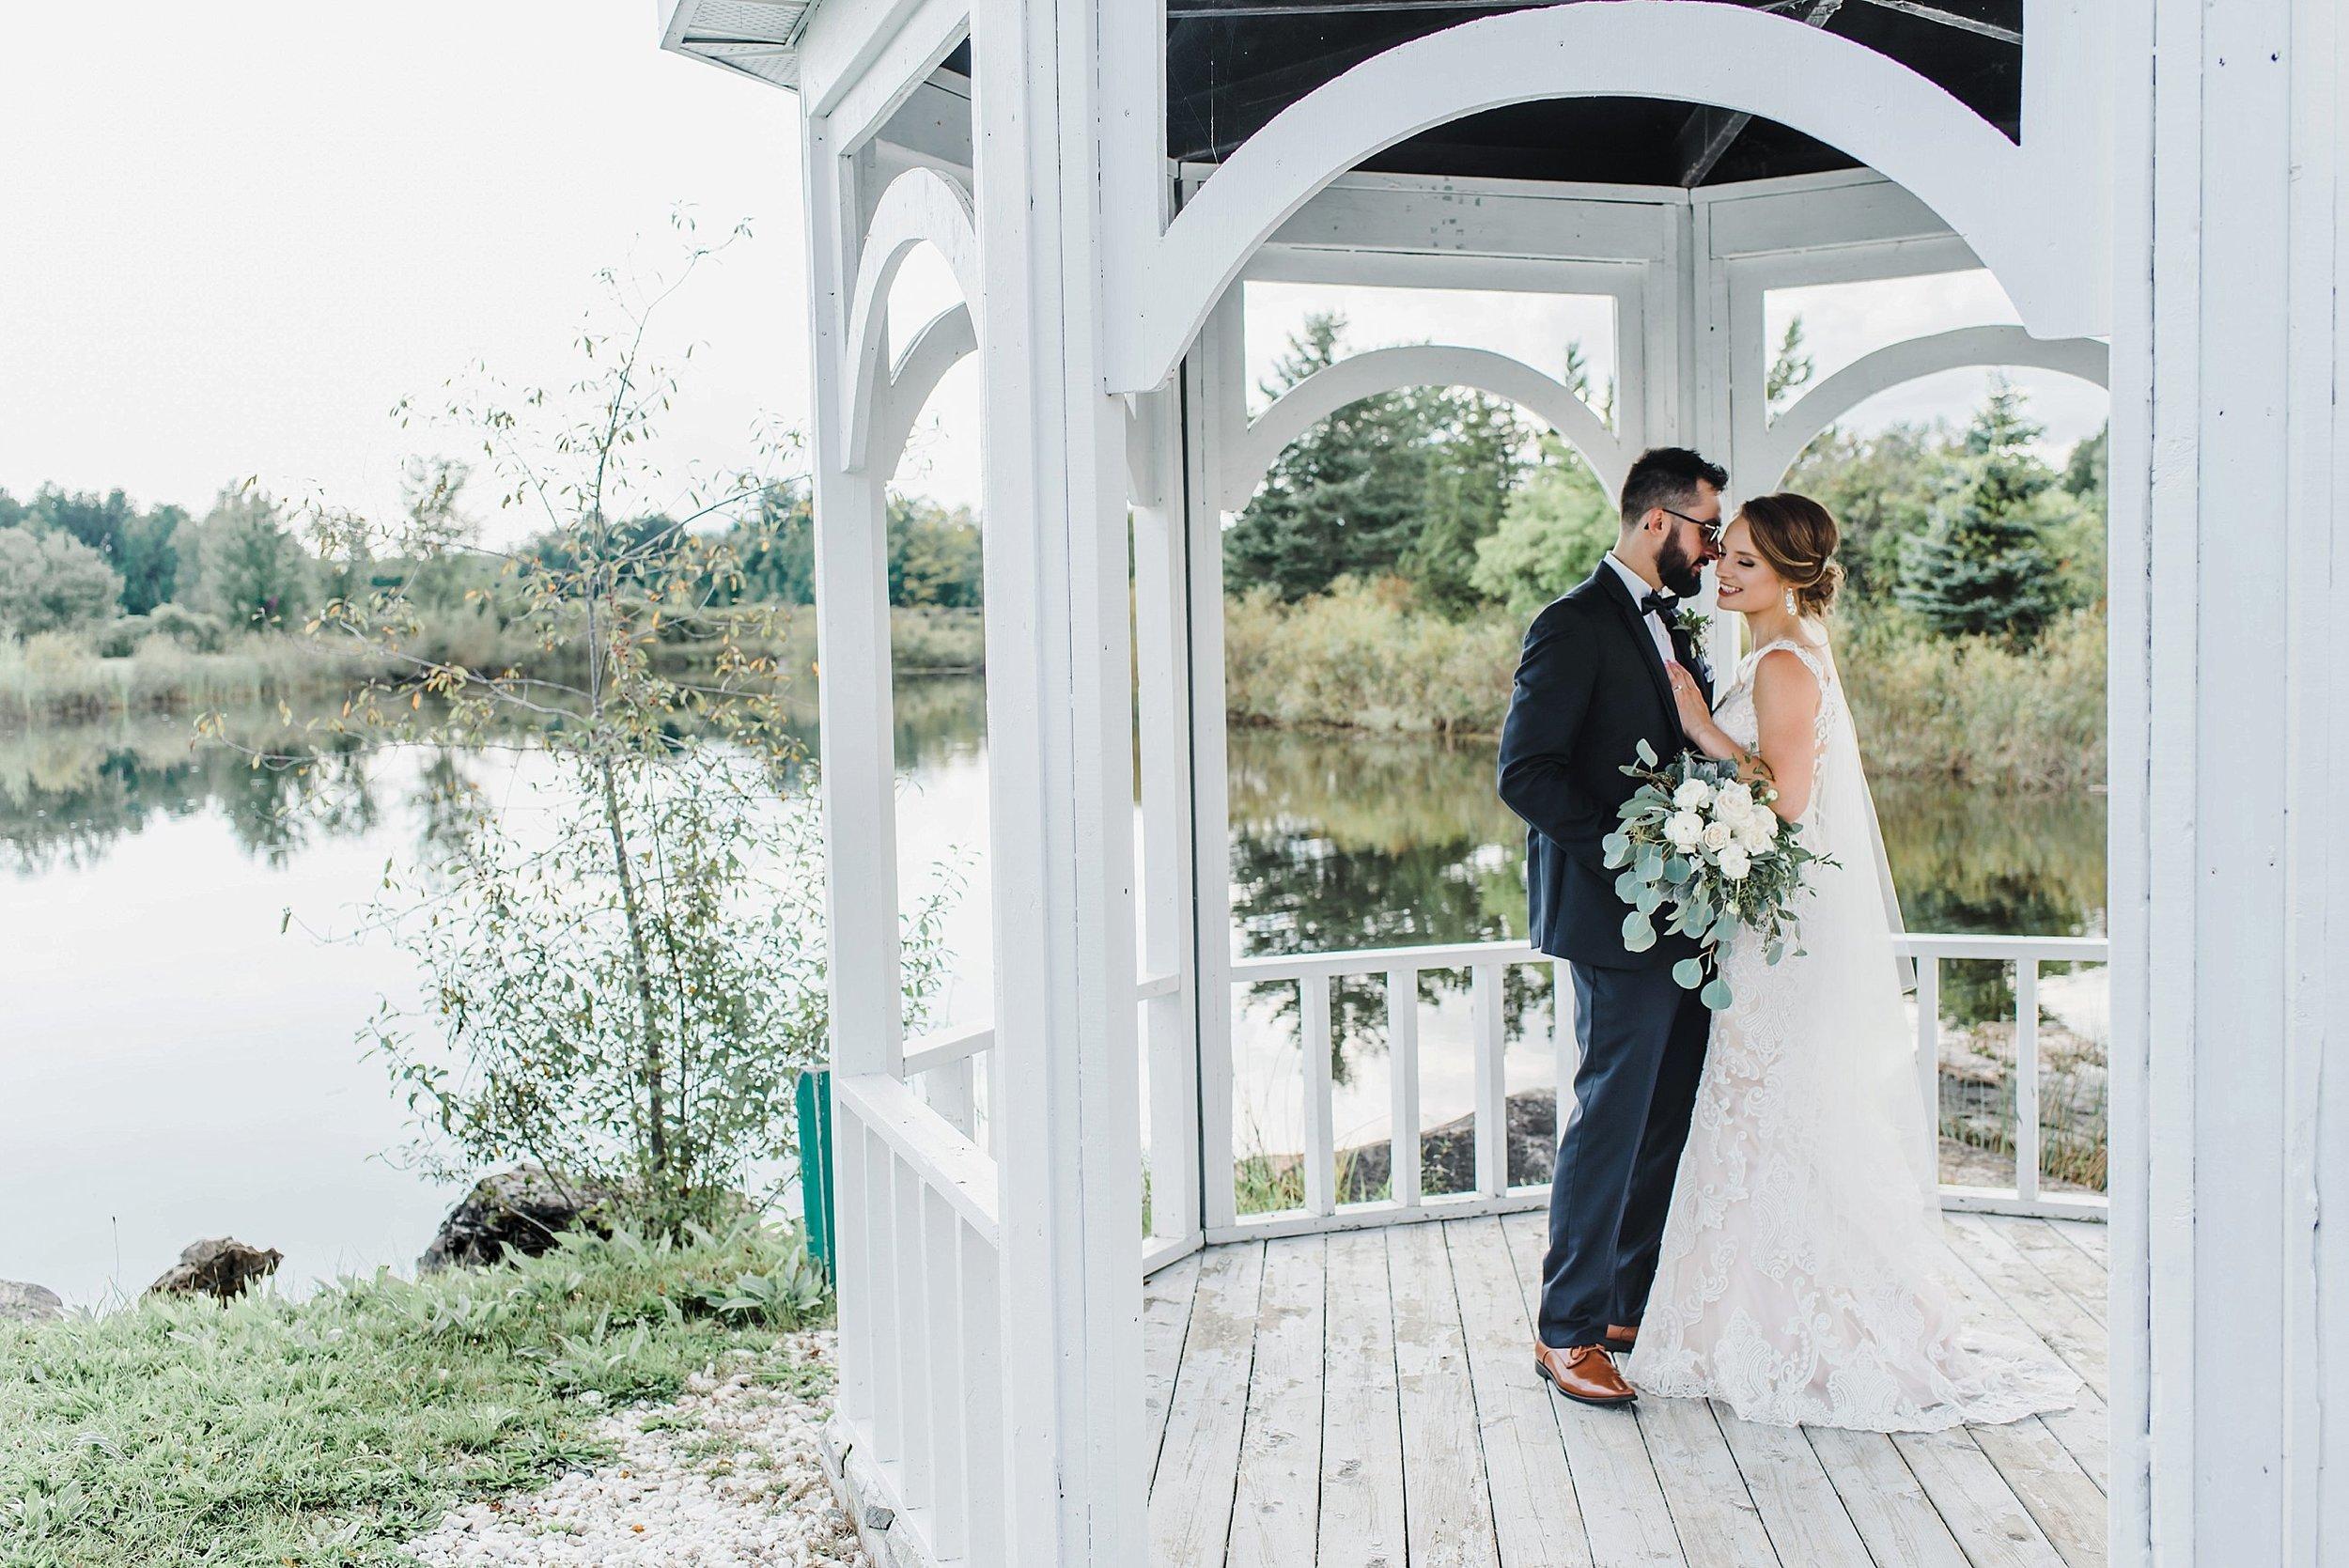 light airy indie fine art ottawa wedding photographer | Ali and Batoul Photography_1292.jpg